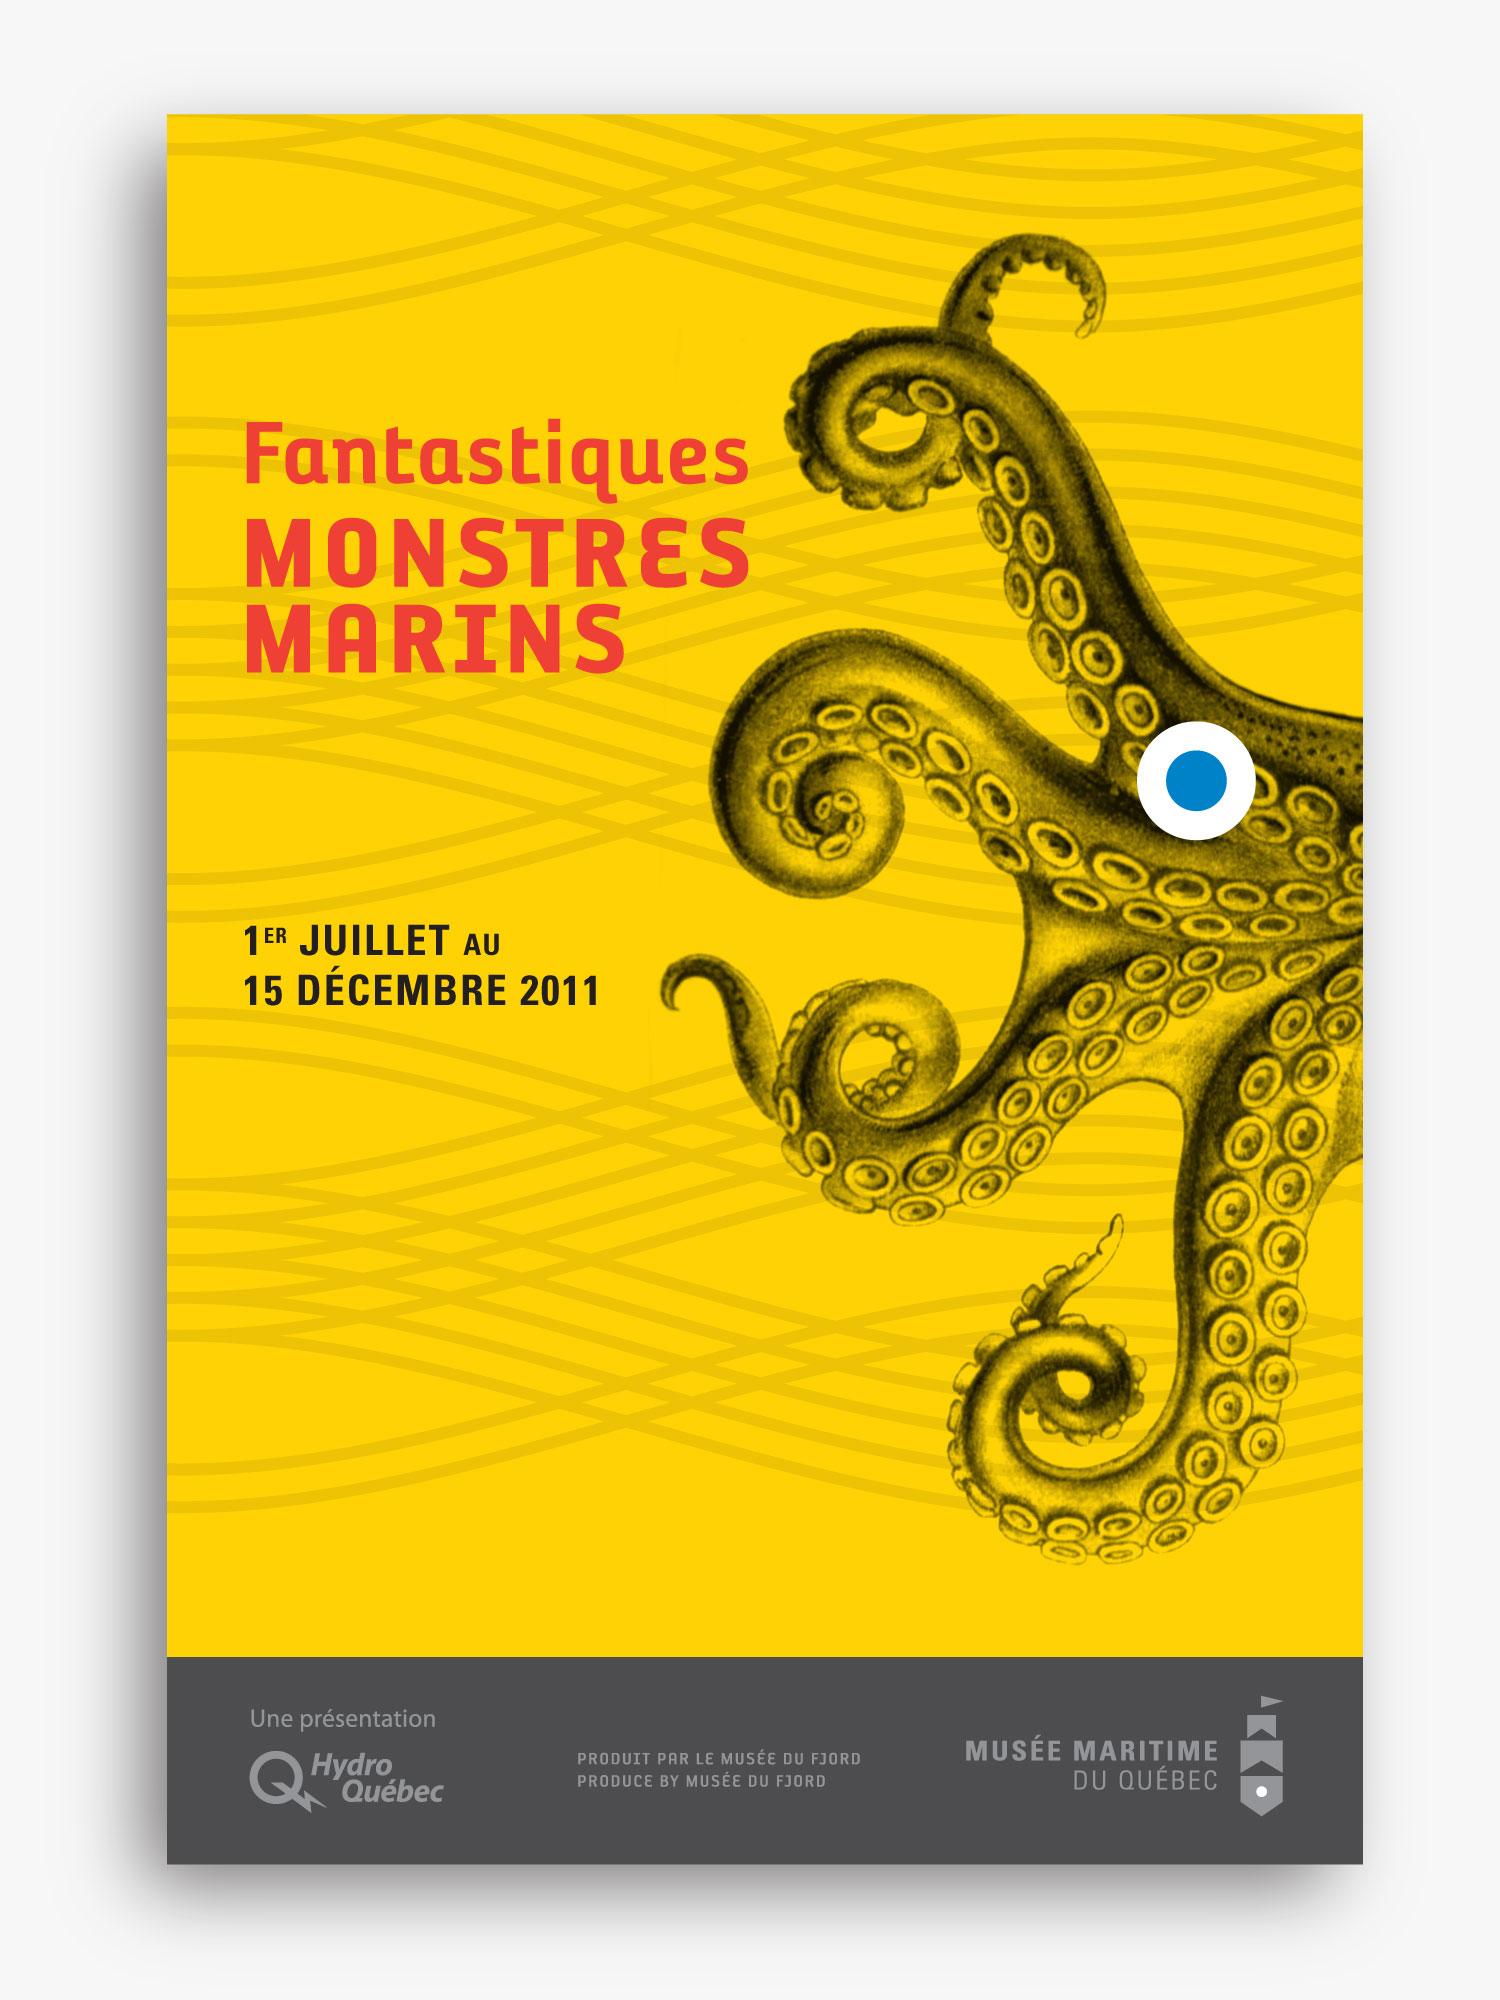 MMQ – Musée maritime du Québec – Identity & Poster by Isabelle Robida – Infrarouge [Design & Culture] – 2007 / 2011 – infrarouge.ca